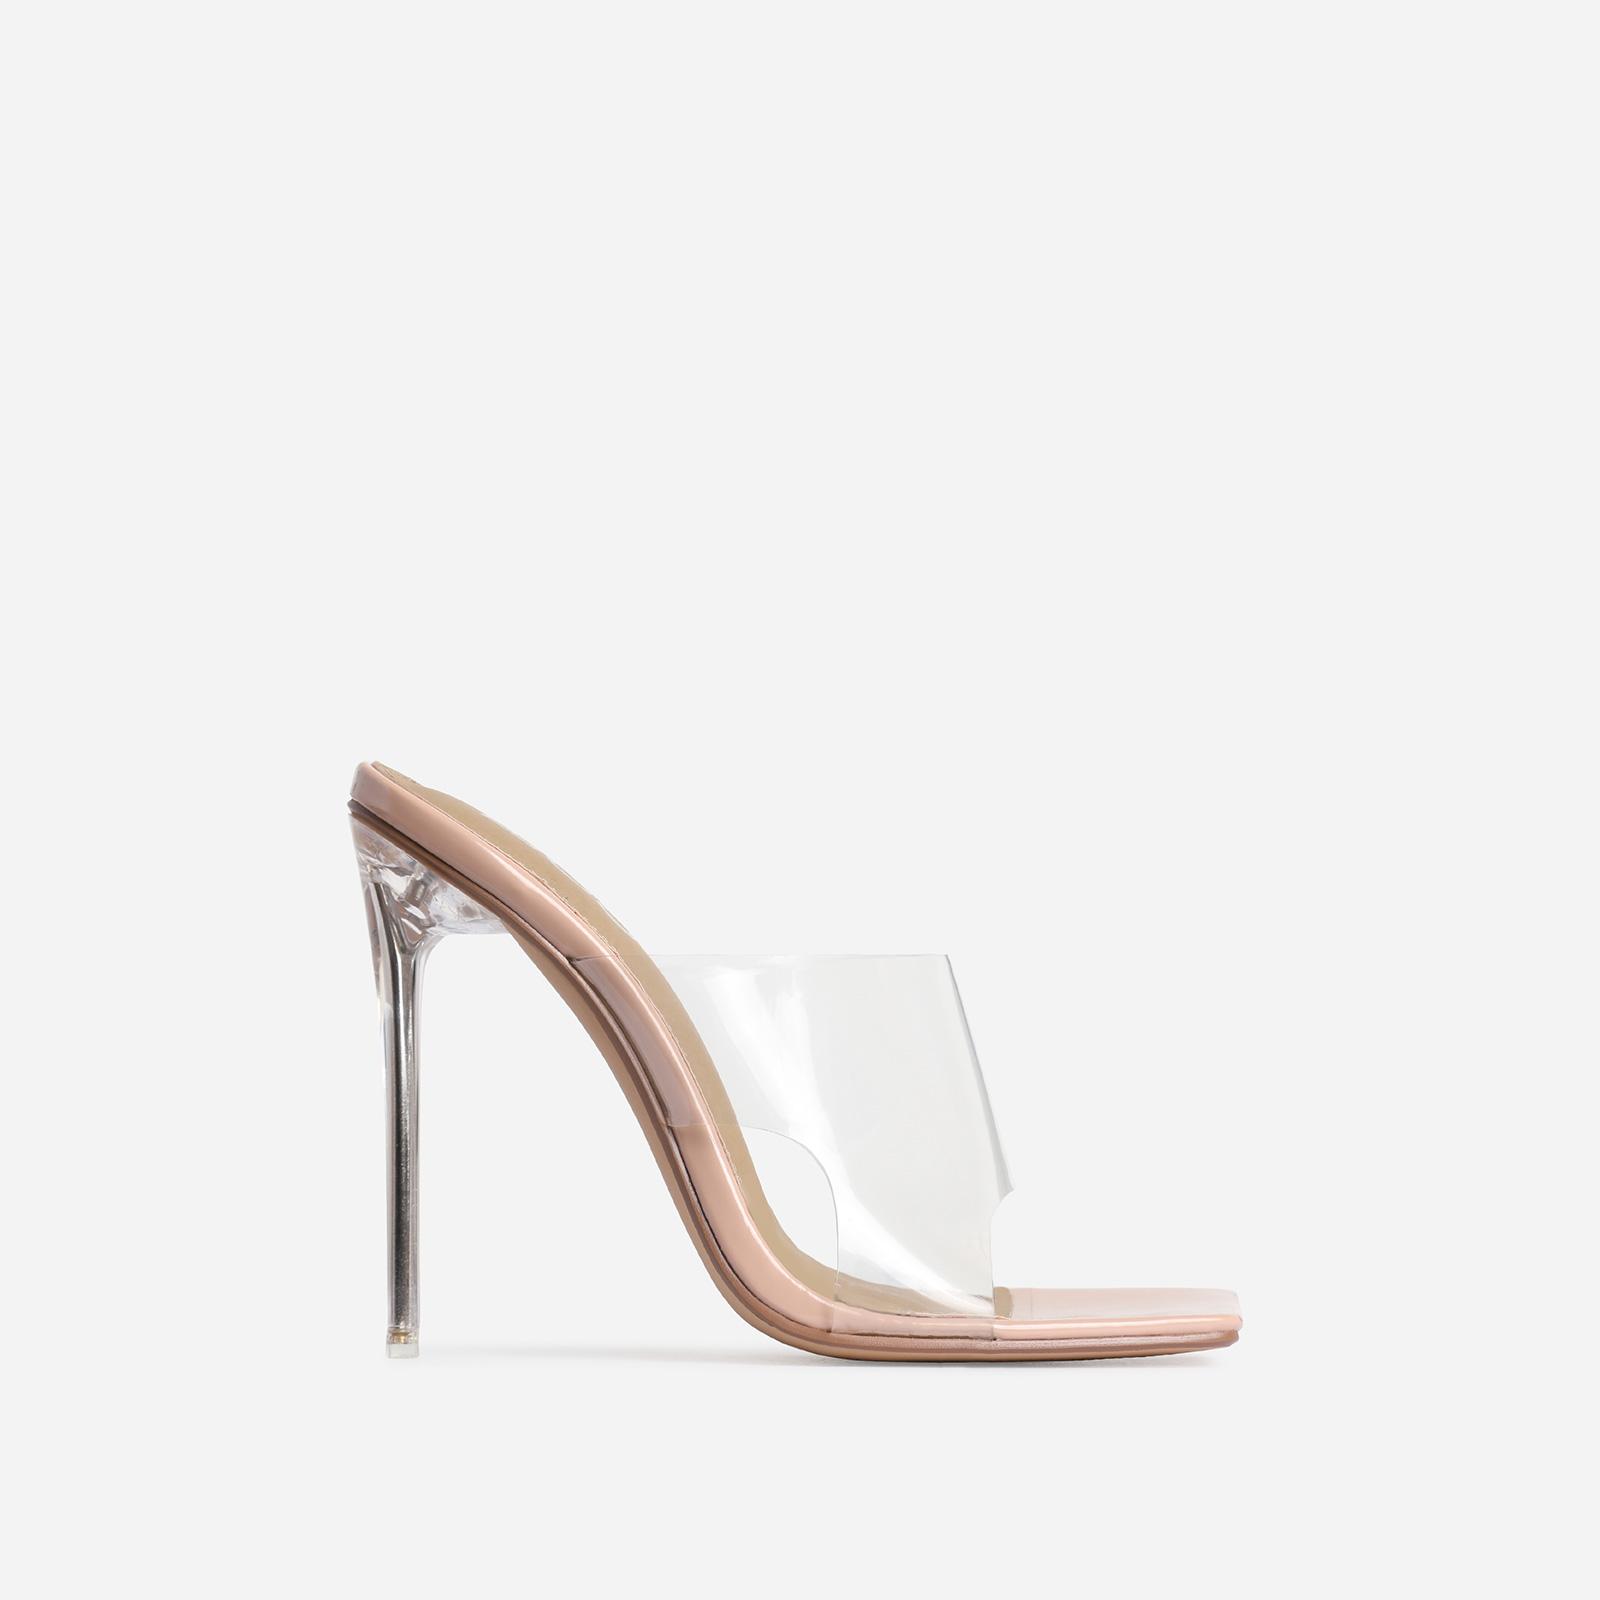 River Perspex Square Peep Toe Heel Mule In Nude Patent